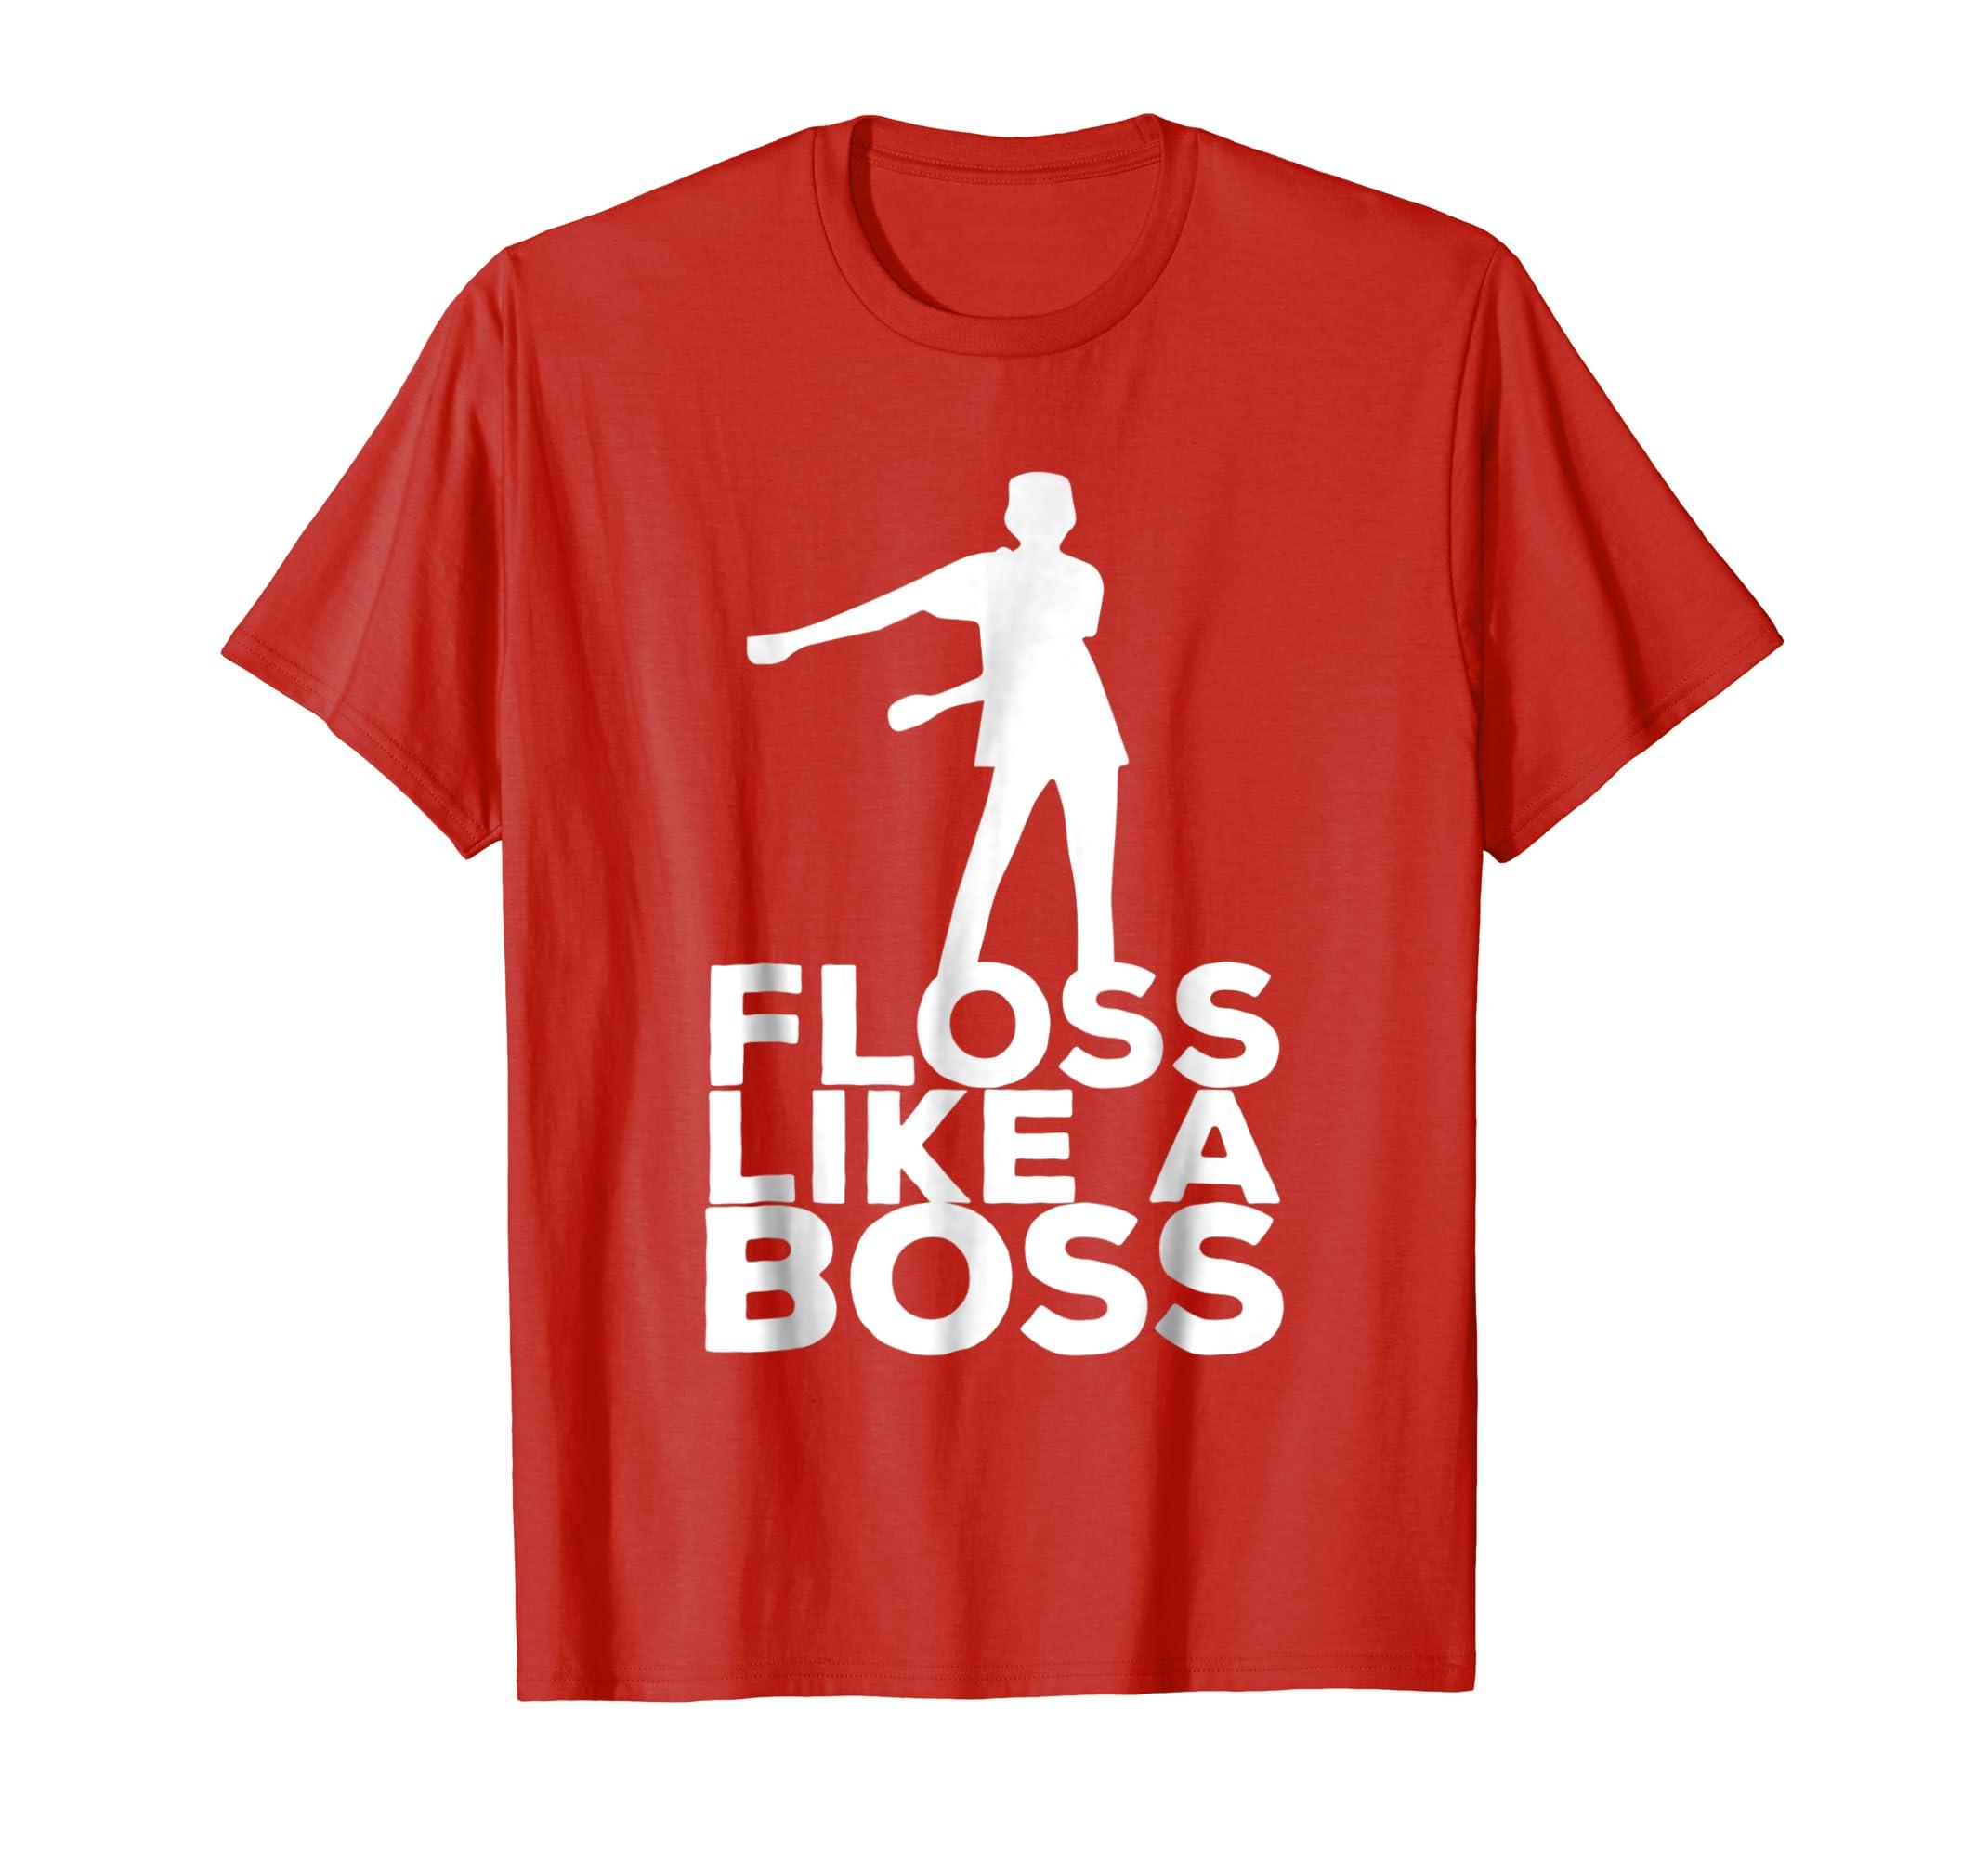 9d825bb40ad2 Amazon.com  Floss Like A Boss Dance T-Shirt  Clothing